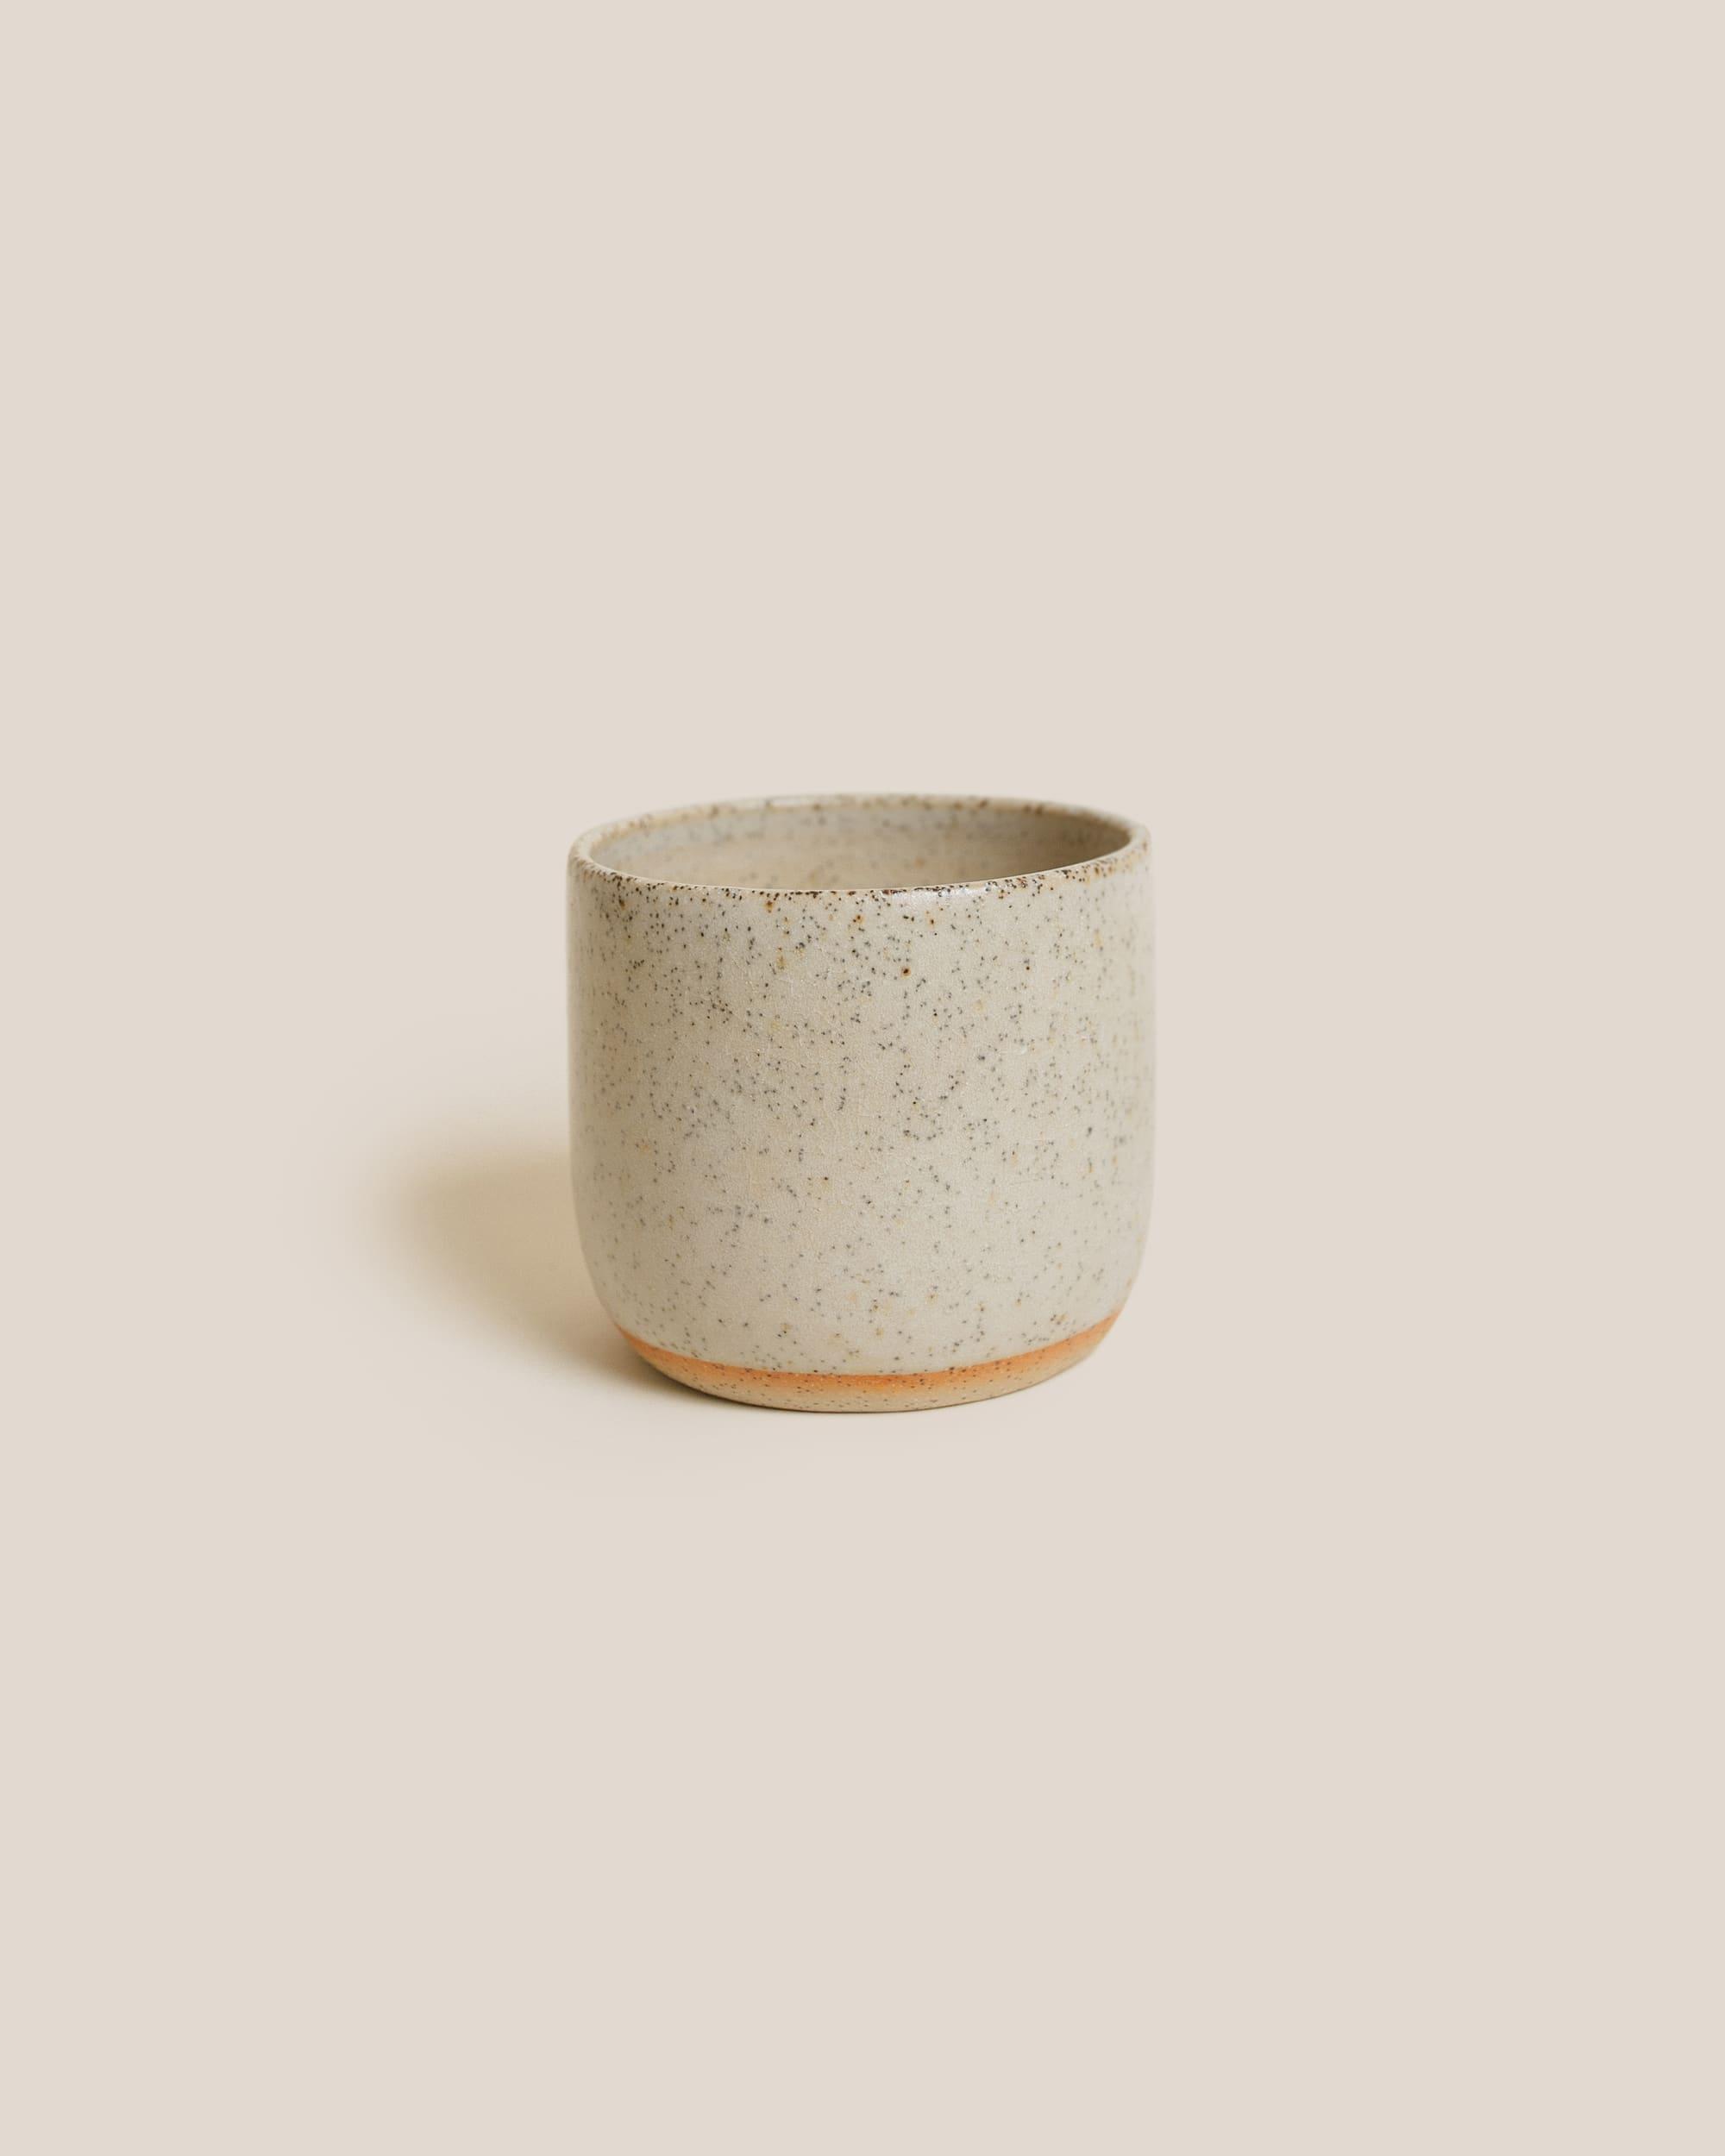 Gingko Ceramics White Glazed Tumbler